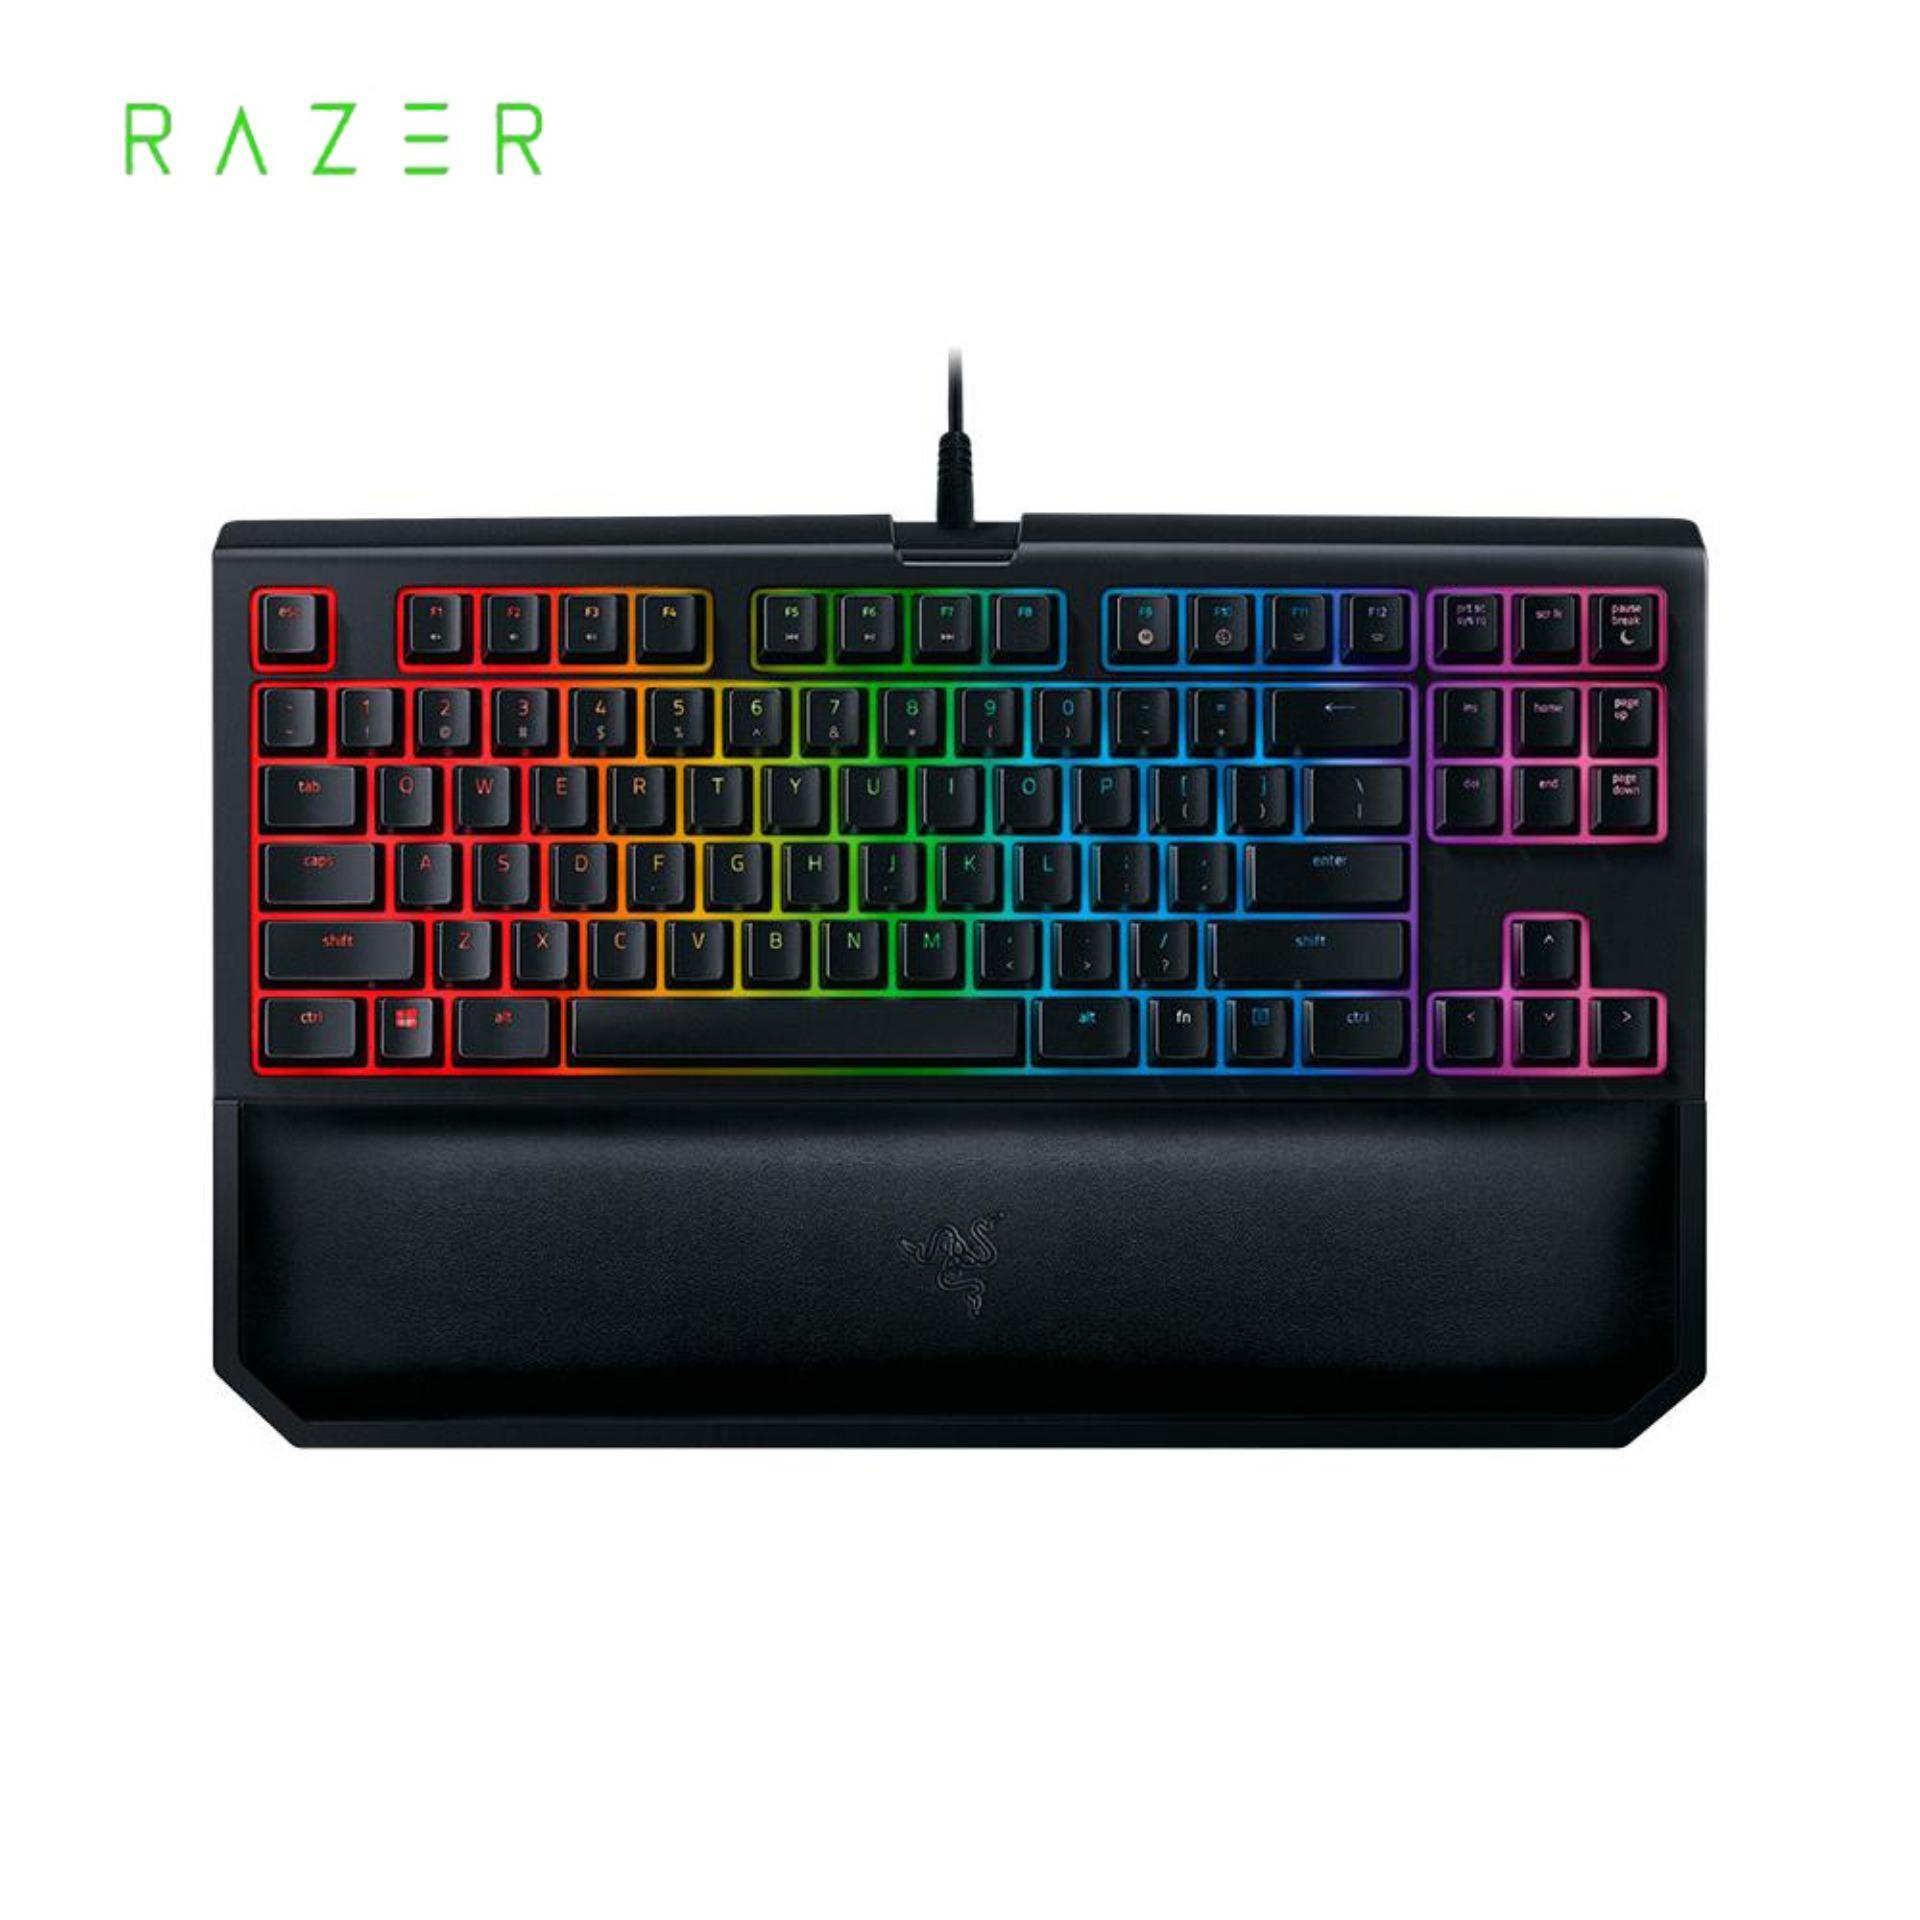 Razer BlackWidow Tournament Edition Chroma V2 Mechanical Gaming Keyboard RGB Backlight 87 Key Ergonomic Orange Switch Singapore